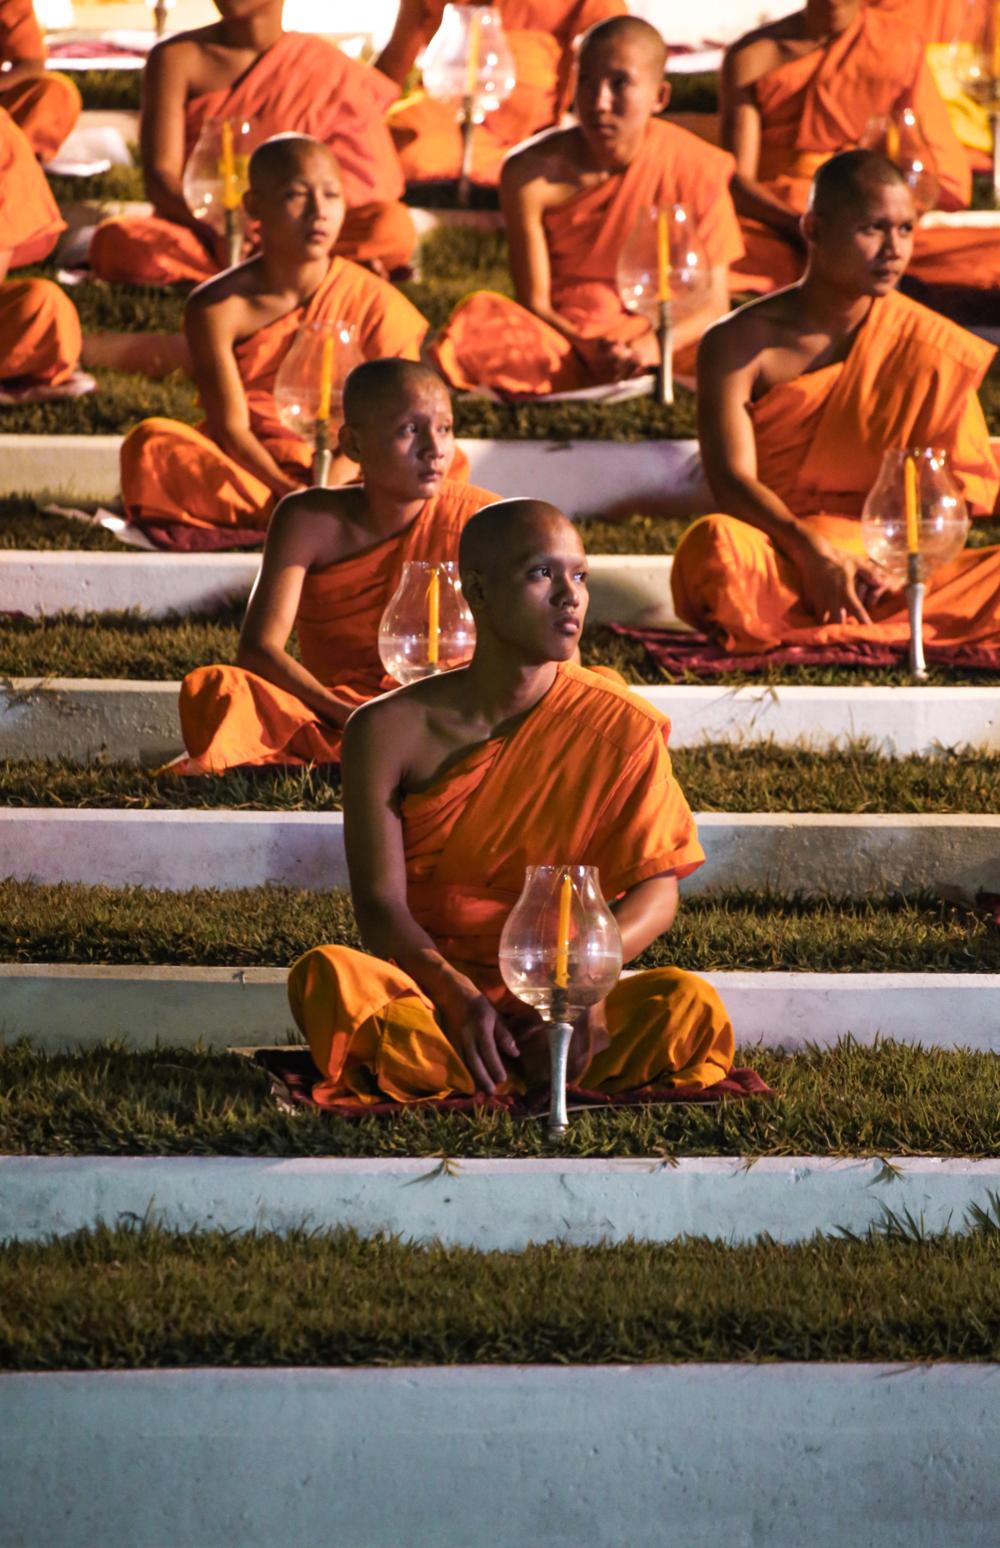 Monks at Yee Peng Lantern Festival in Chiang Mai Thailand @howfarfromhome